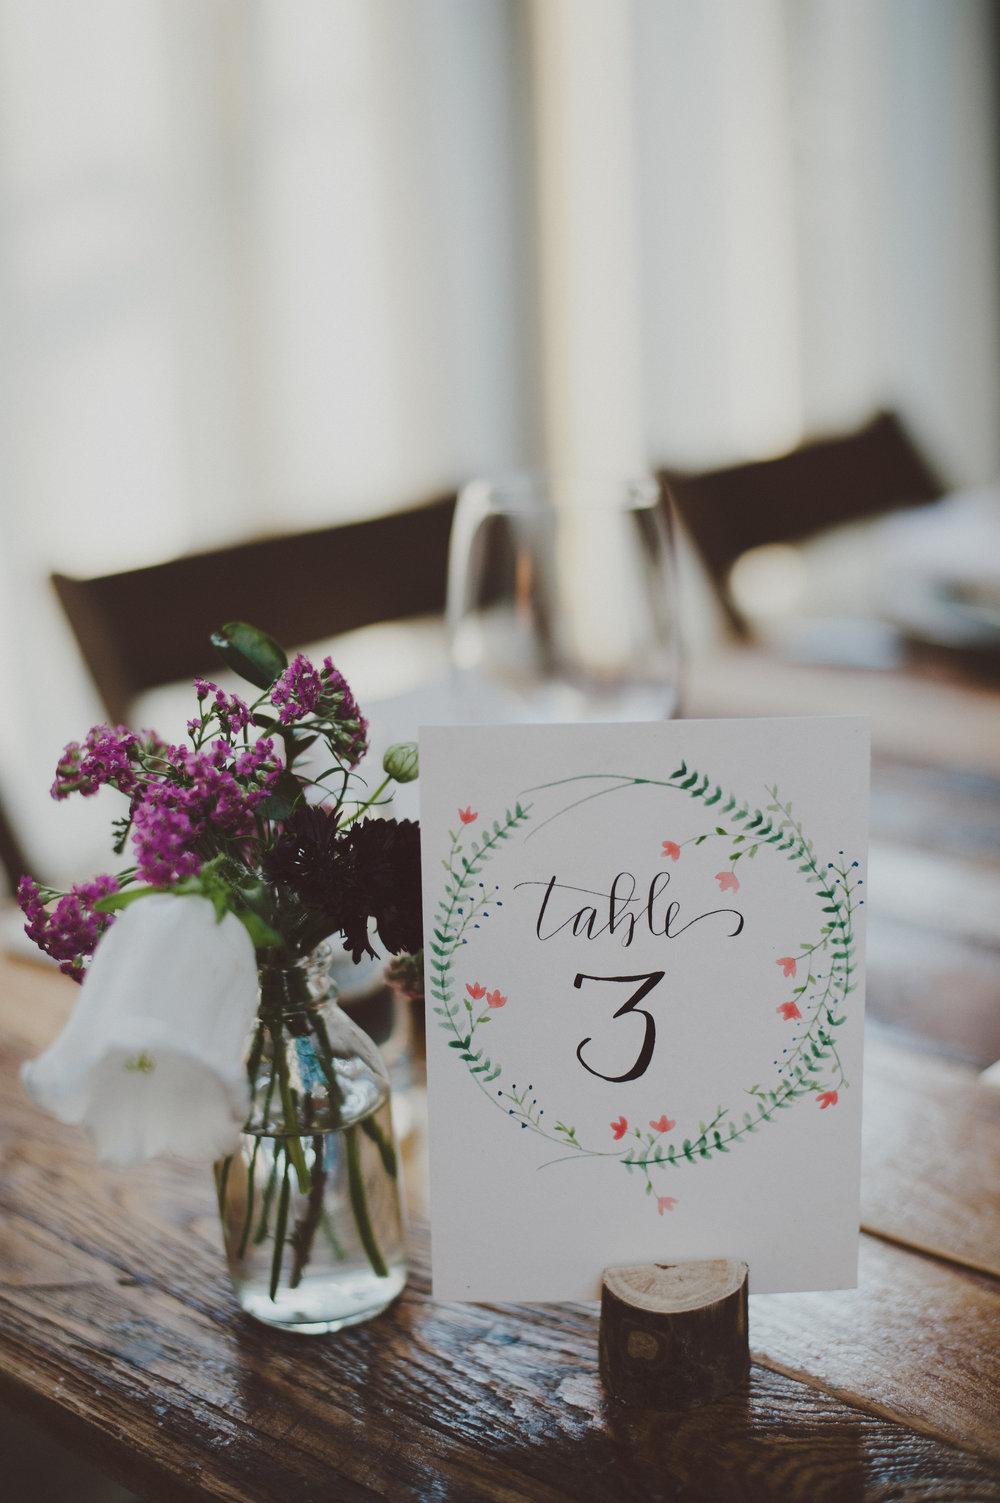 San Antonio Calligraphy South Texas Calligraphy Wedding Modern Calligraphy Weddings Table Numbers details